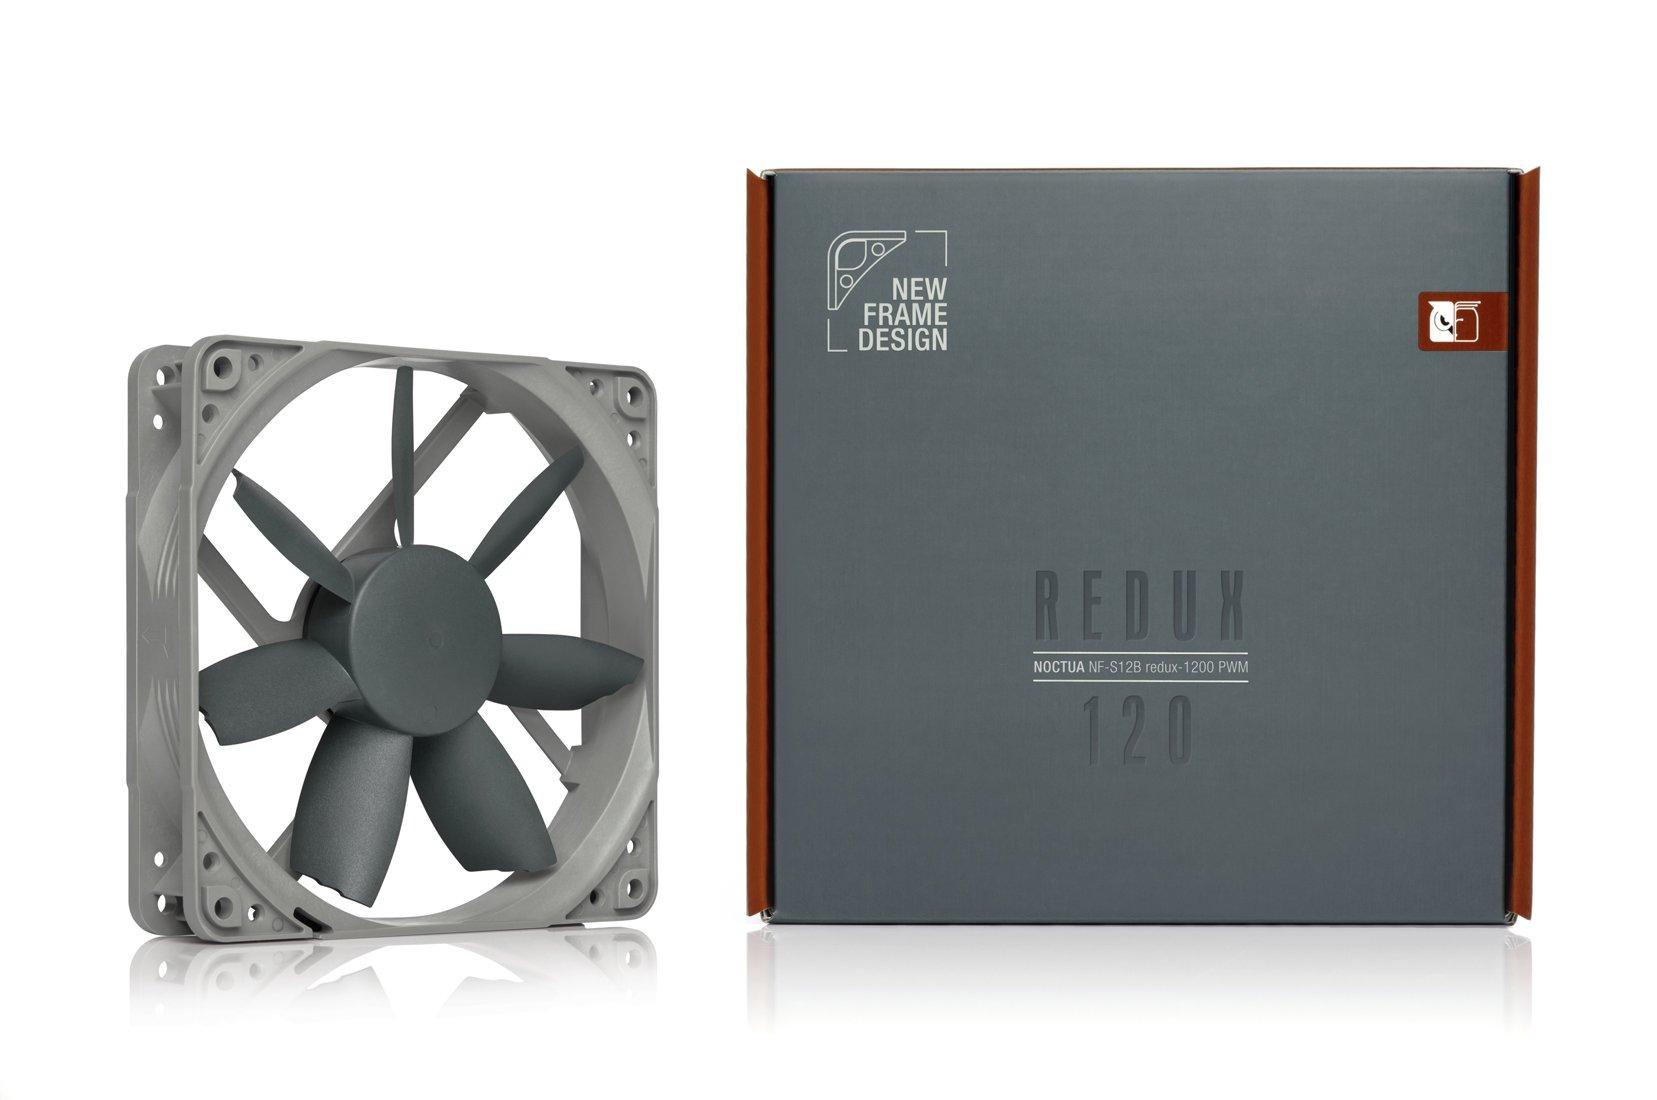 Noctua SSO Bearing Fan Retail Cooling NF-S12B redux-1200 PWM by noctua (Image #4)